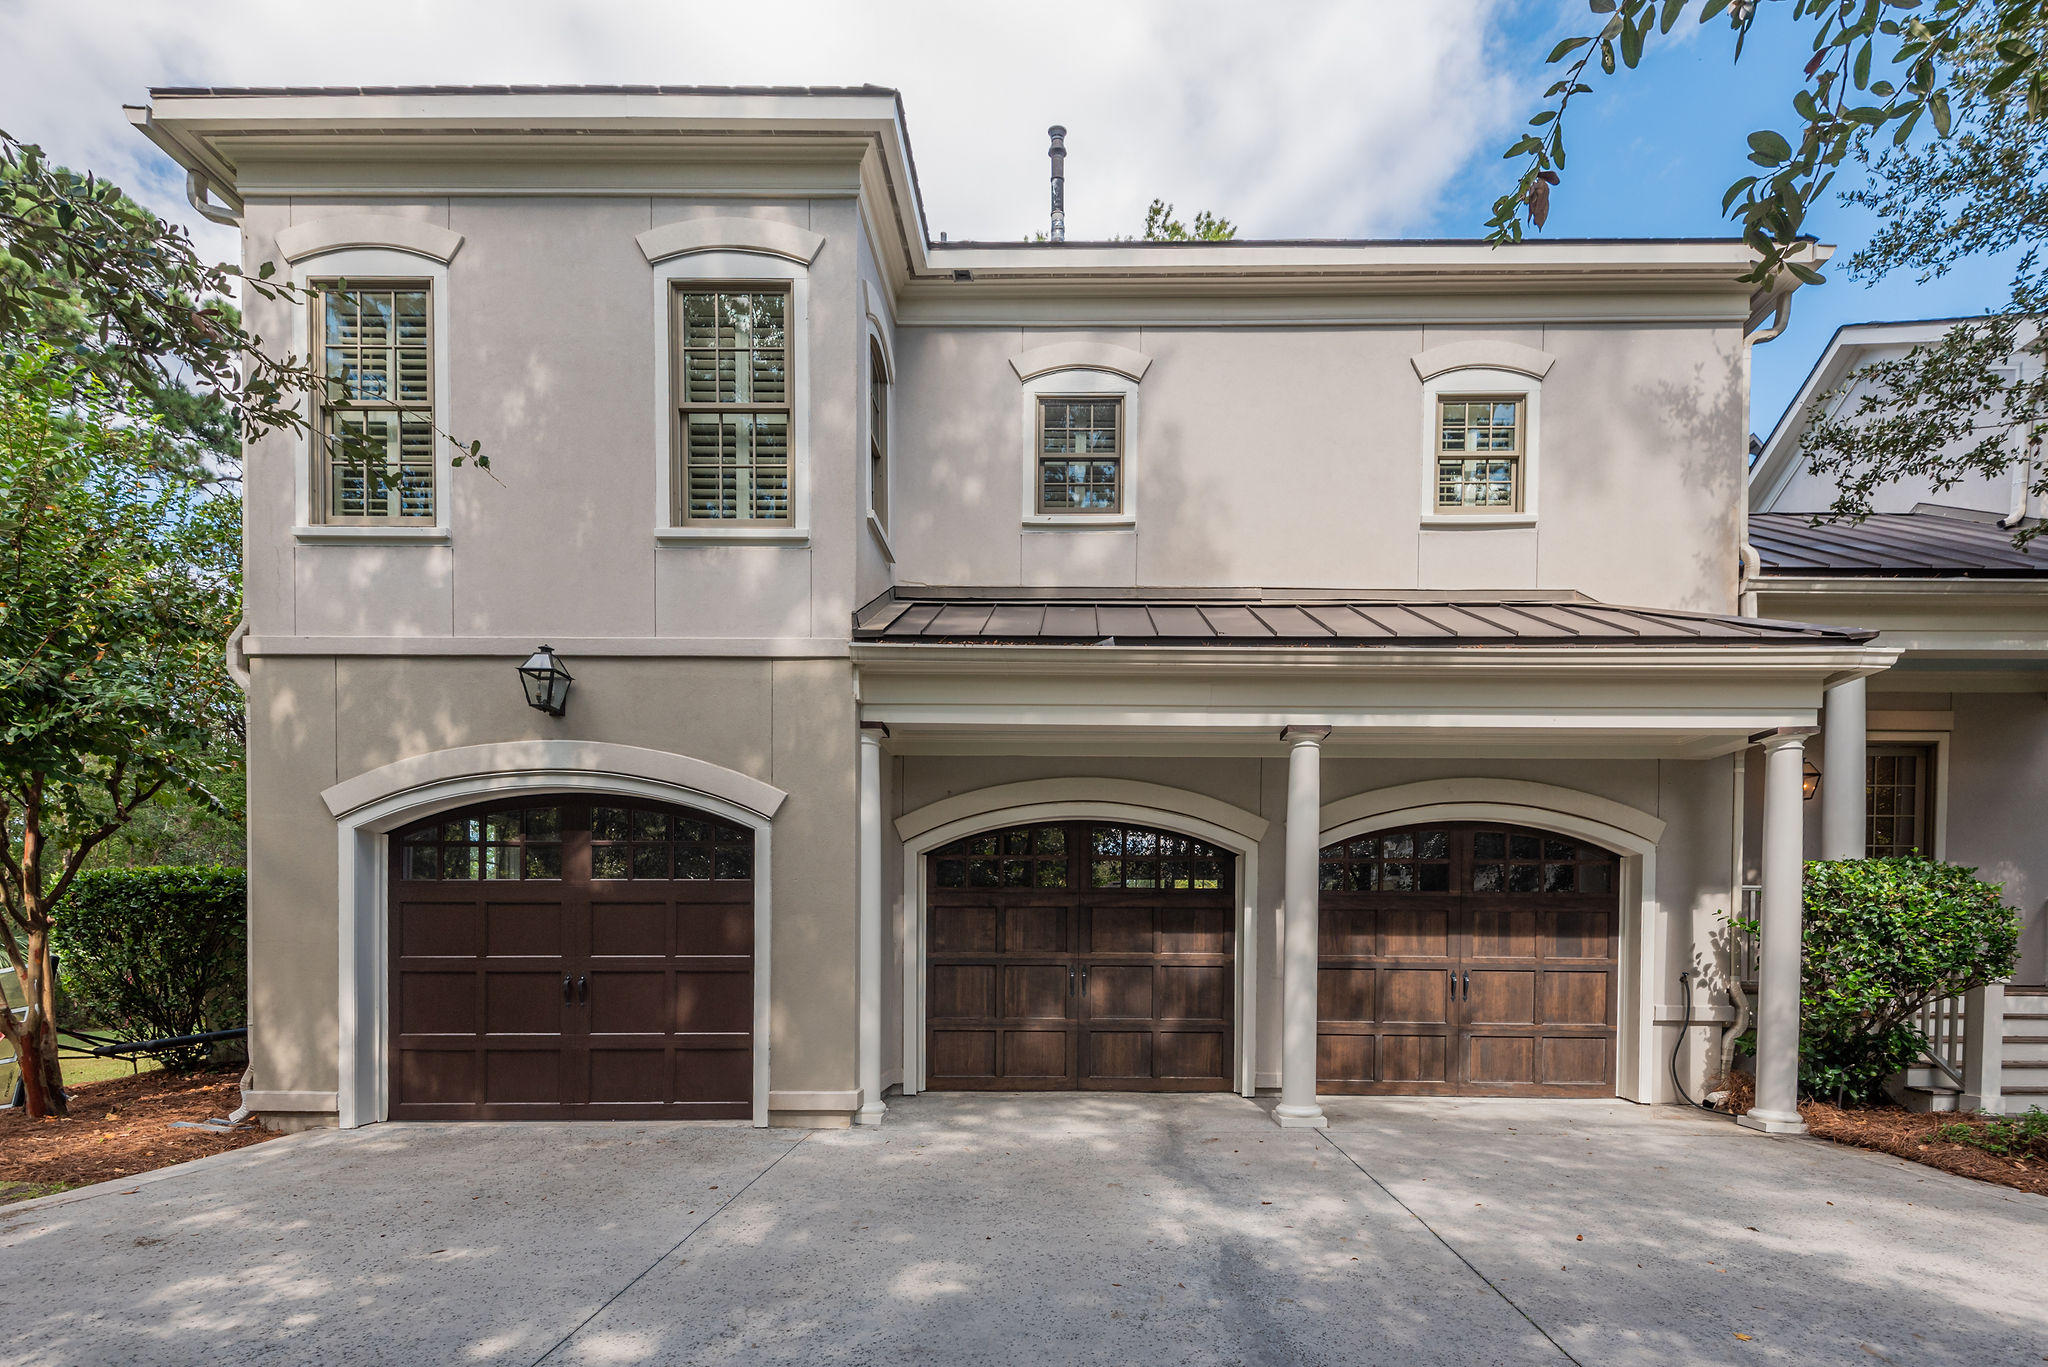 Daniel Island Park Homes For Sale - 312 Hidden Bottom, Charleston, SC - 33